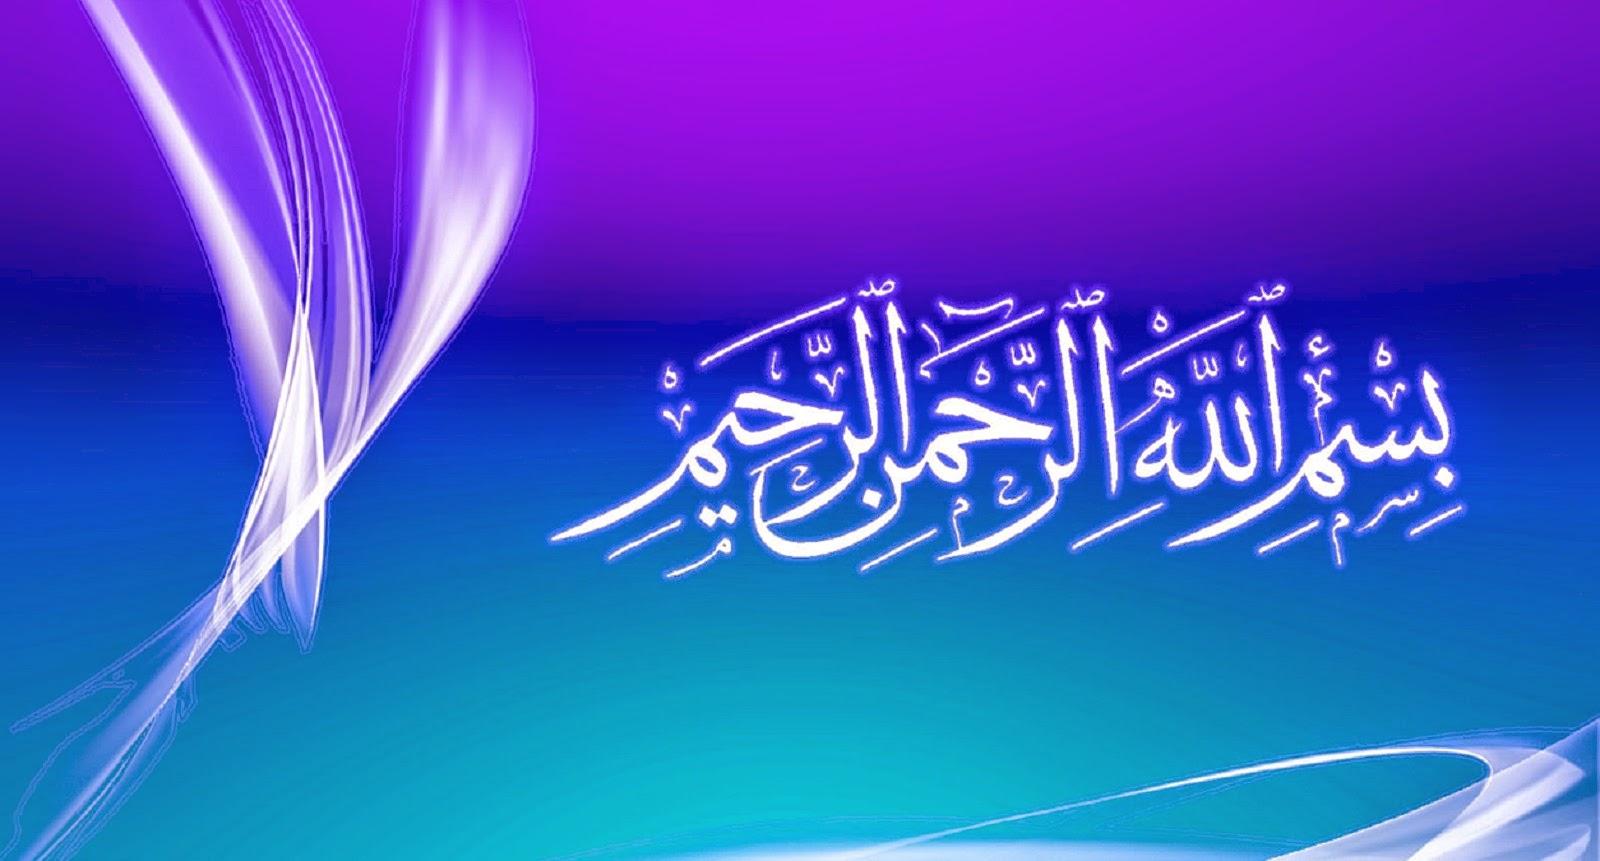 Free download Latest Bismillah Wallpapers HD Wallpapers Haal ...